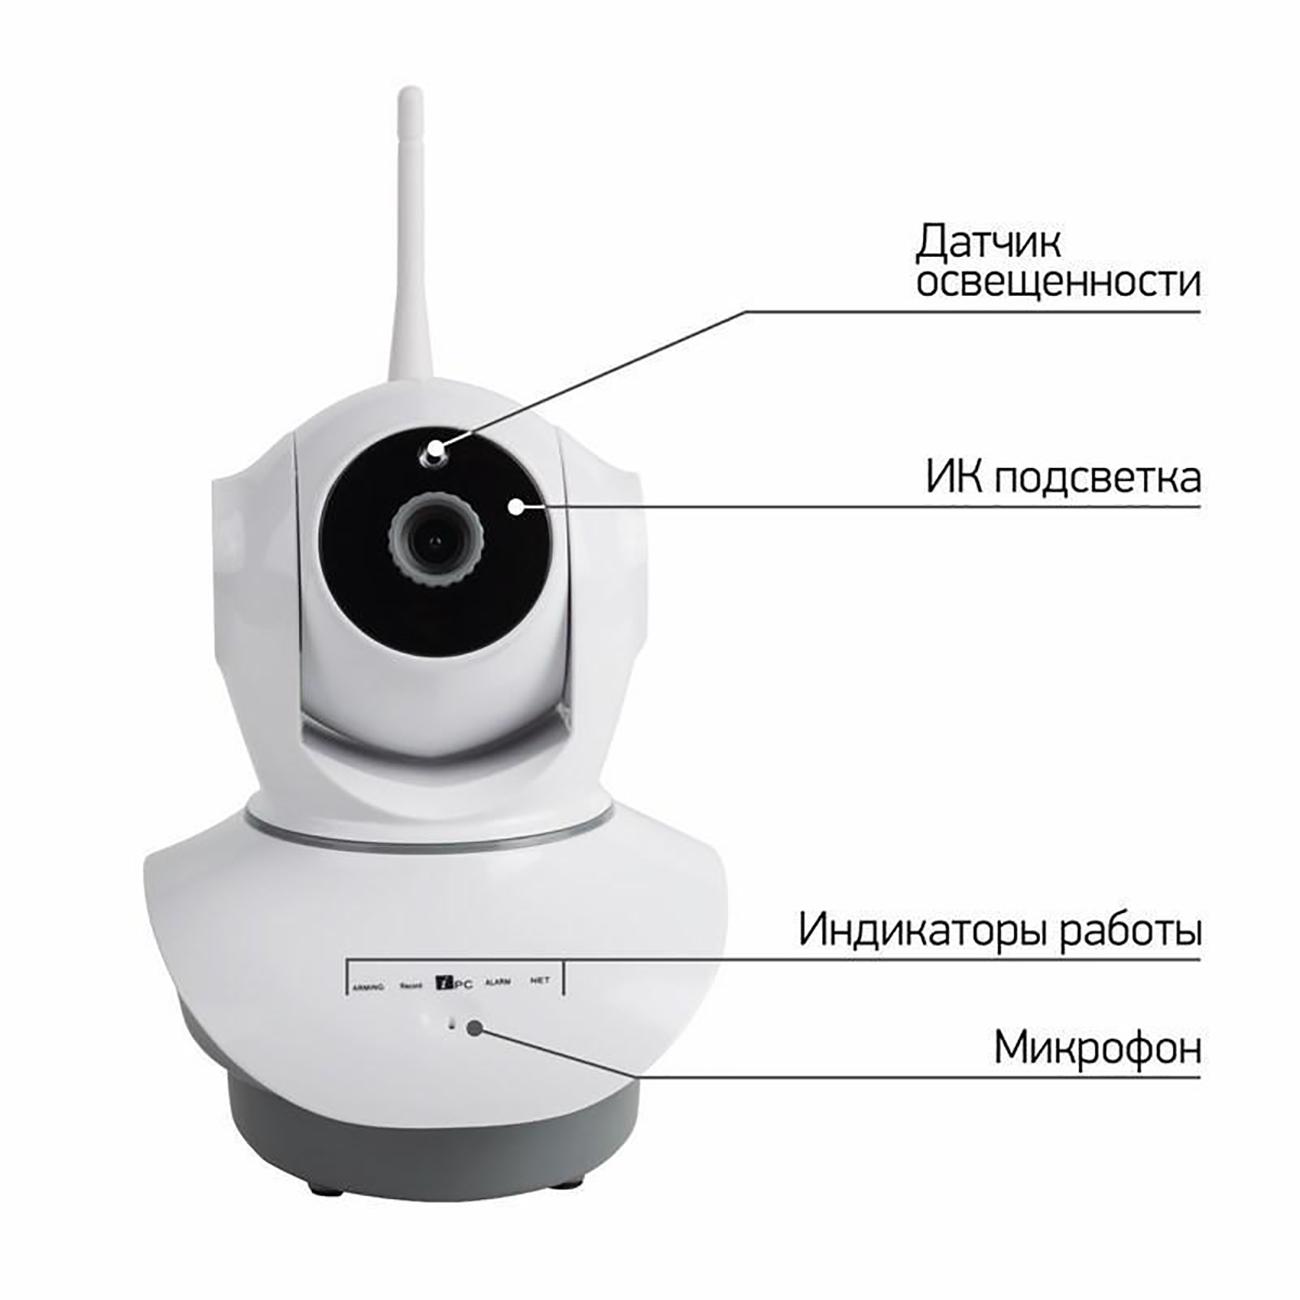 Фото Беспроводная поворотная 4G (LTE) Smart HD камера Rexant, ИК до 10 м {45-0269} (2)